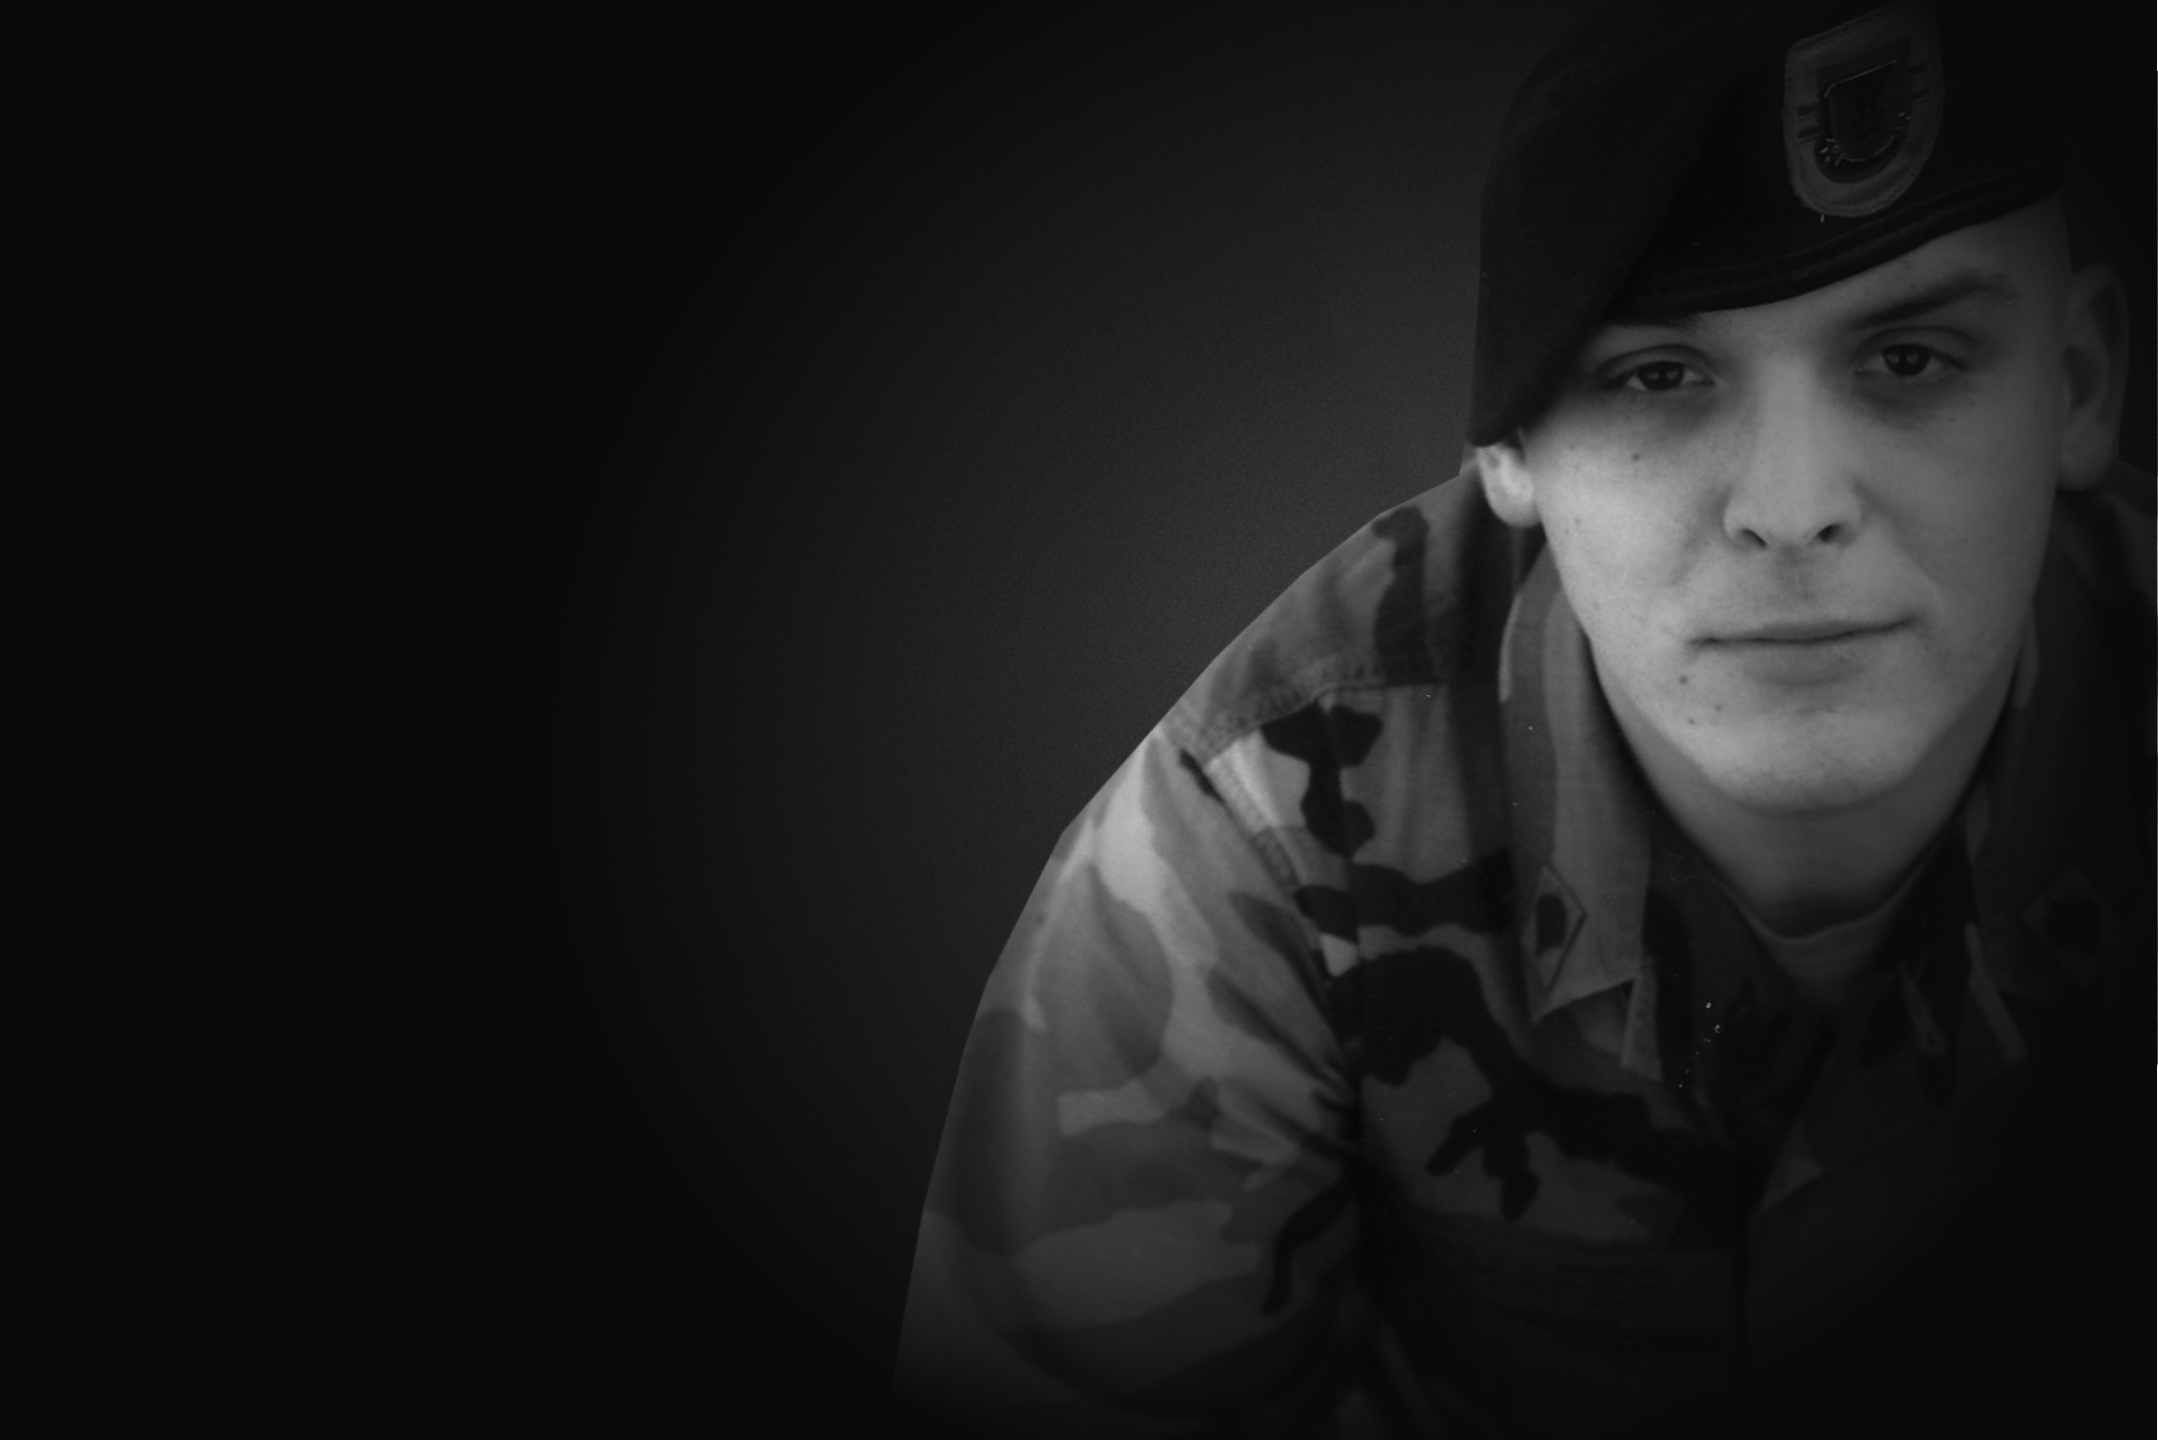 BG Image Soldier